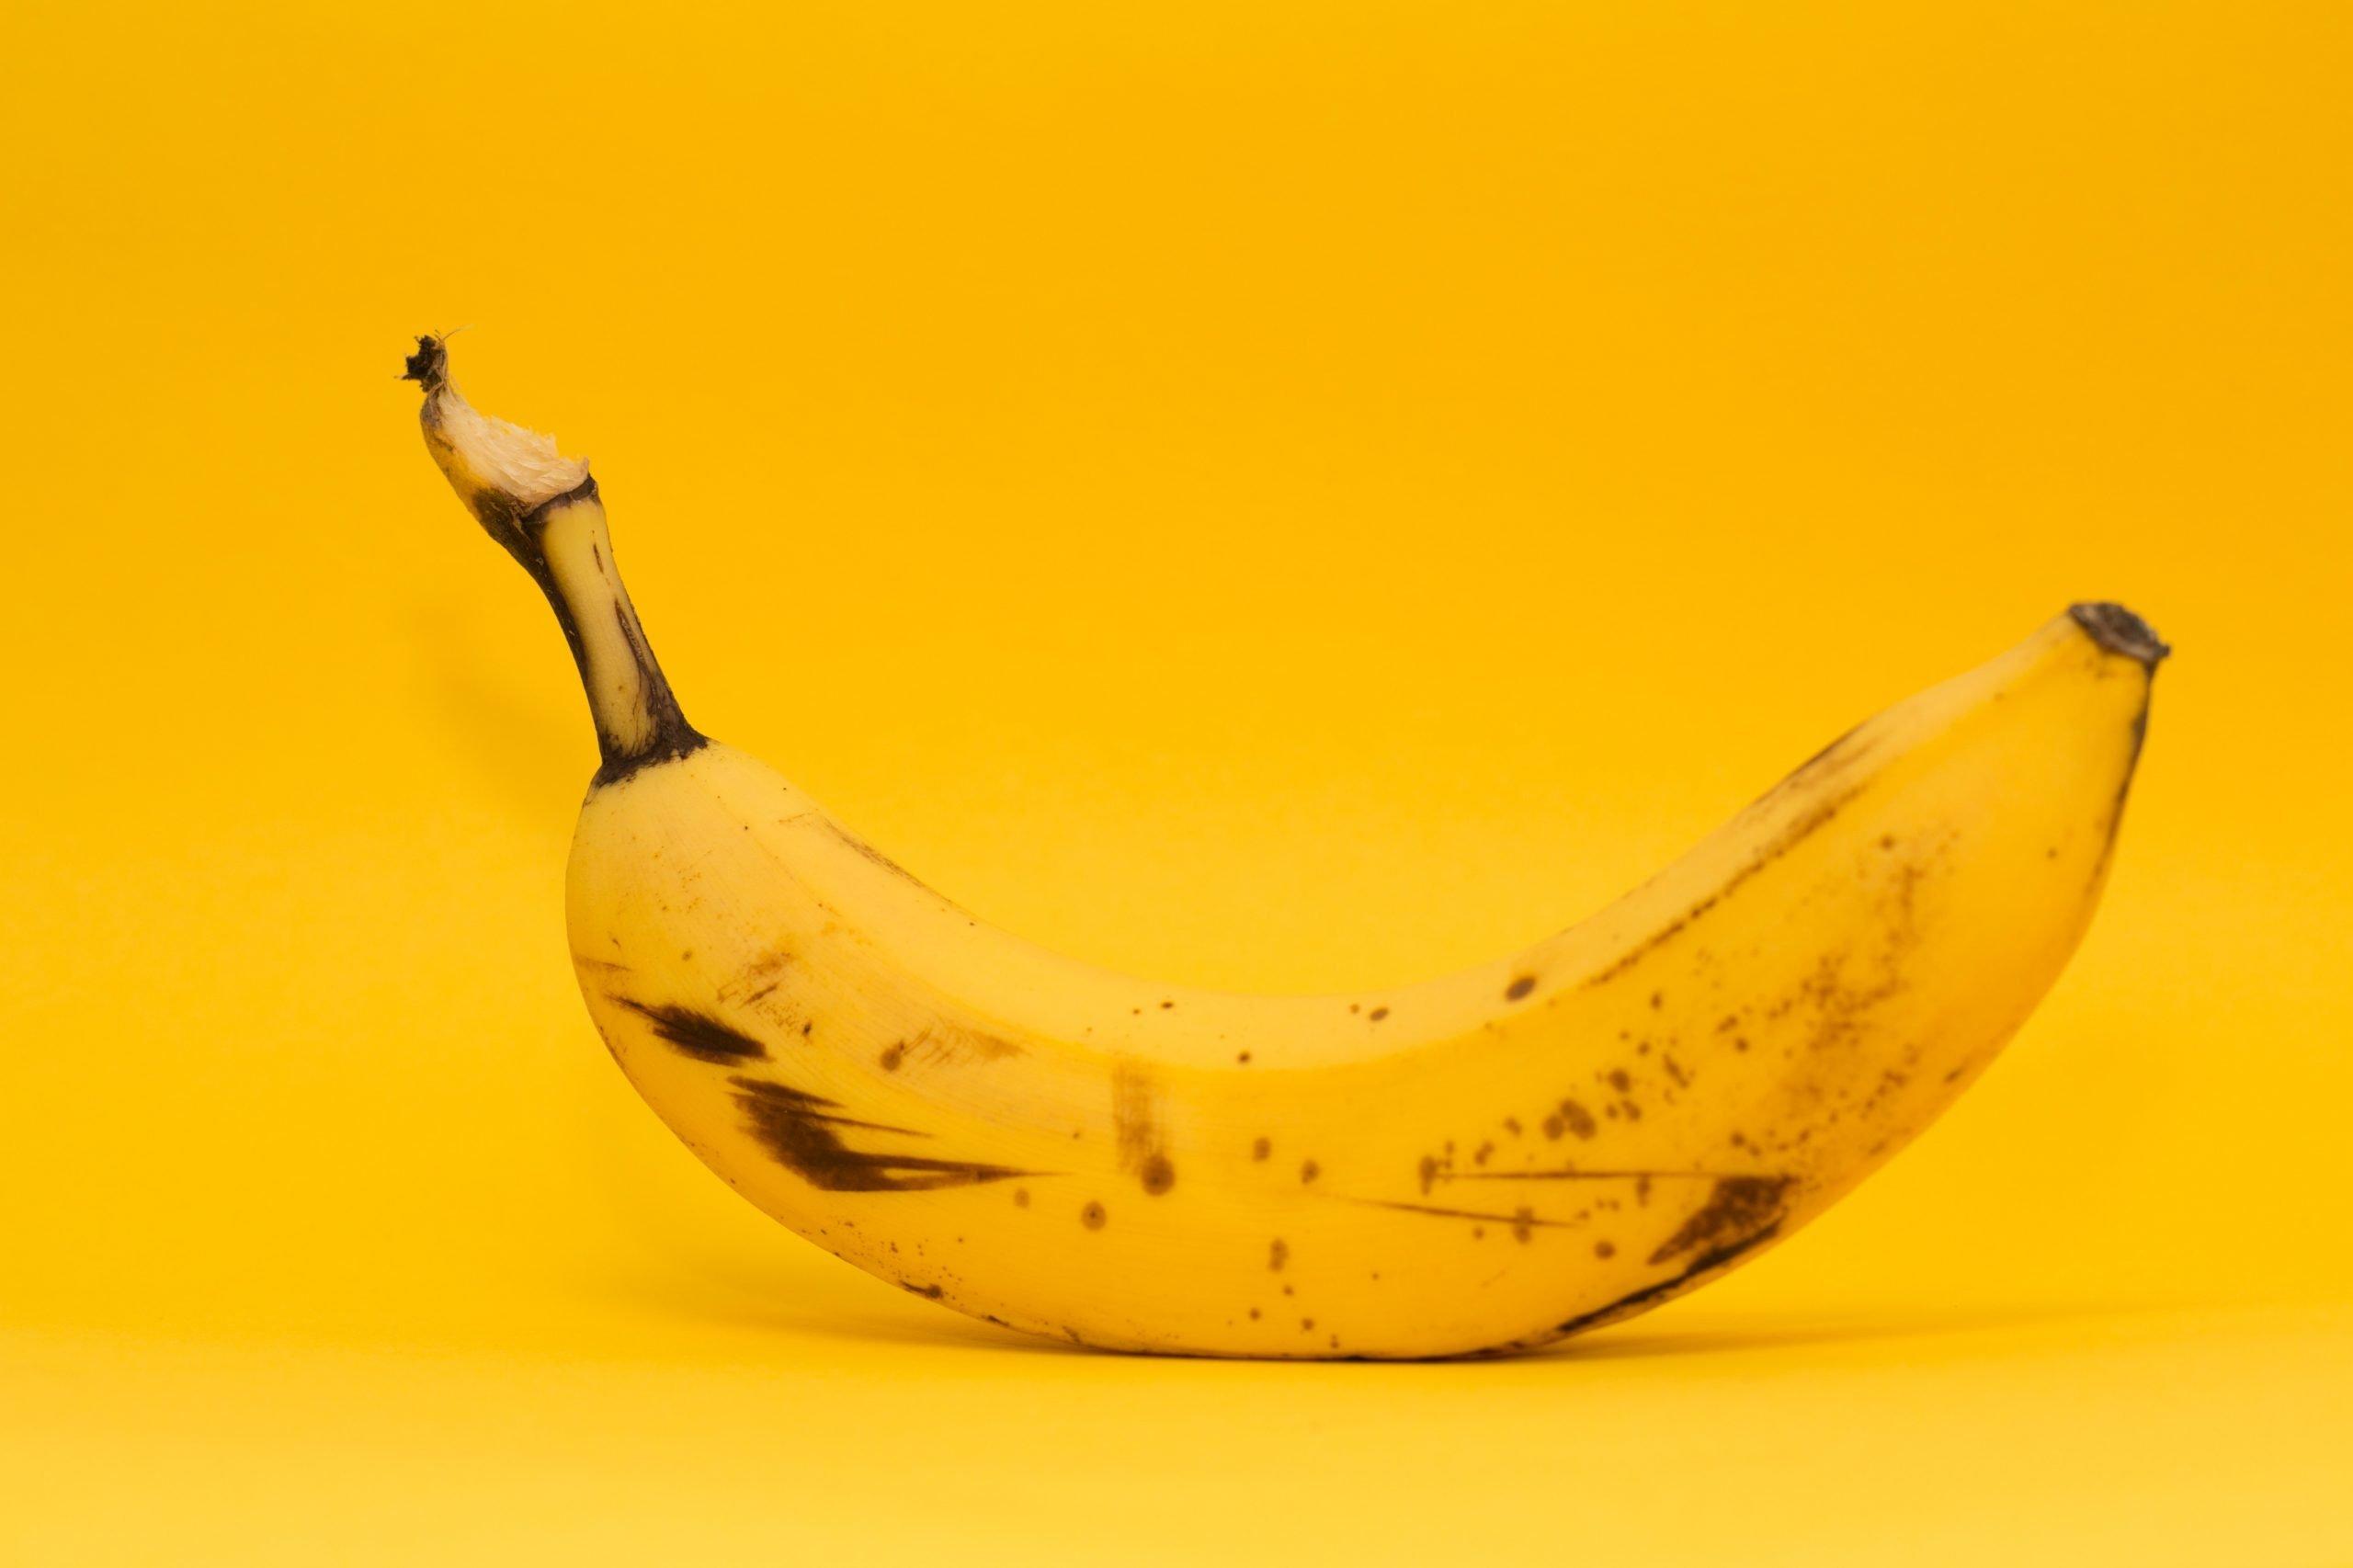 muzun faydalari muzun icinde bulunan vitaminler